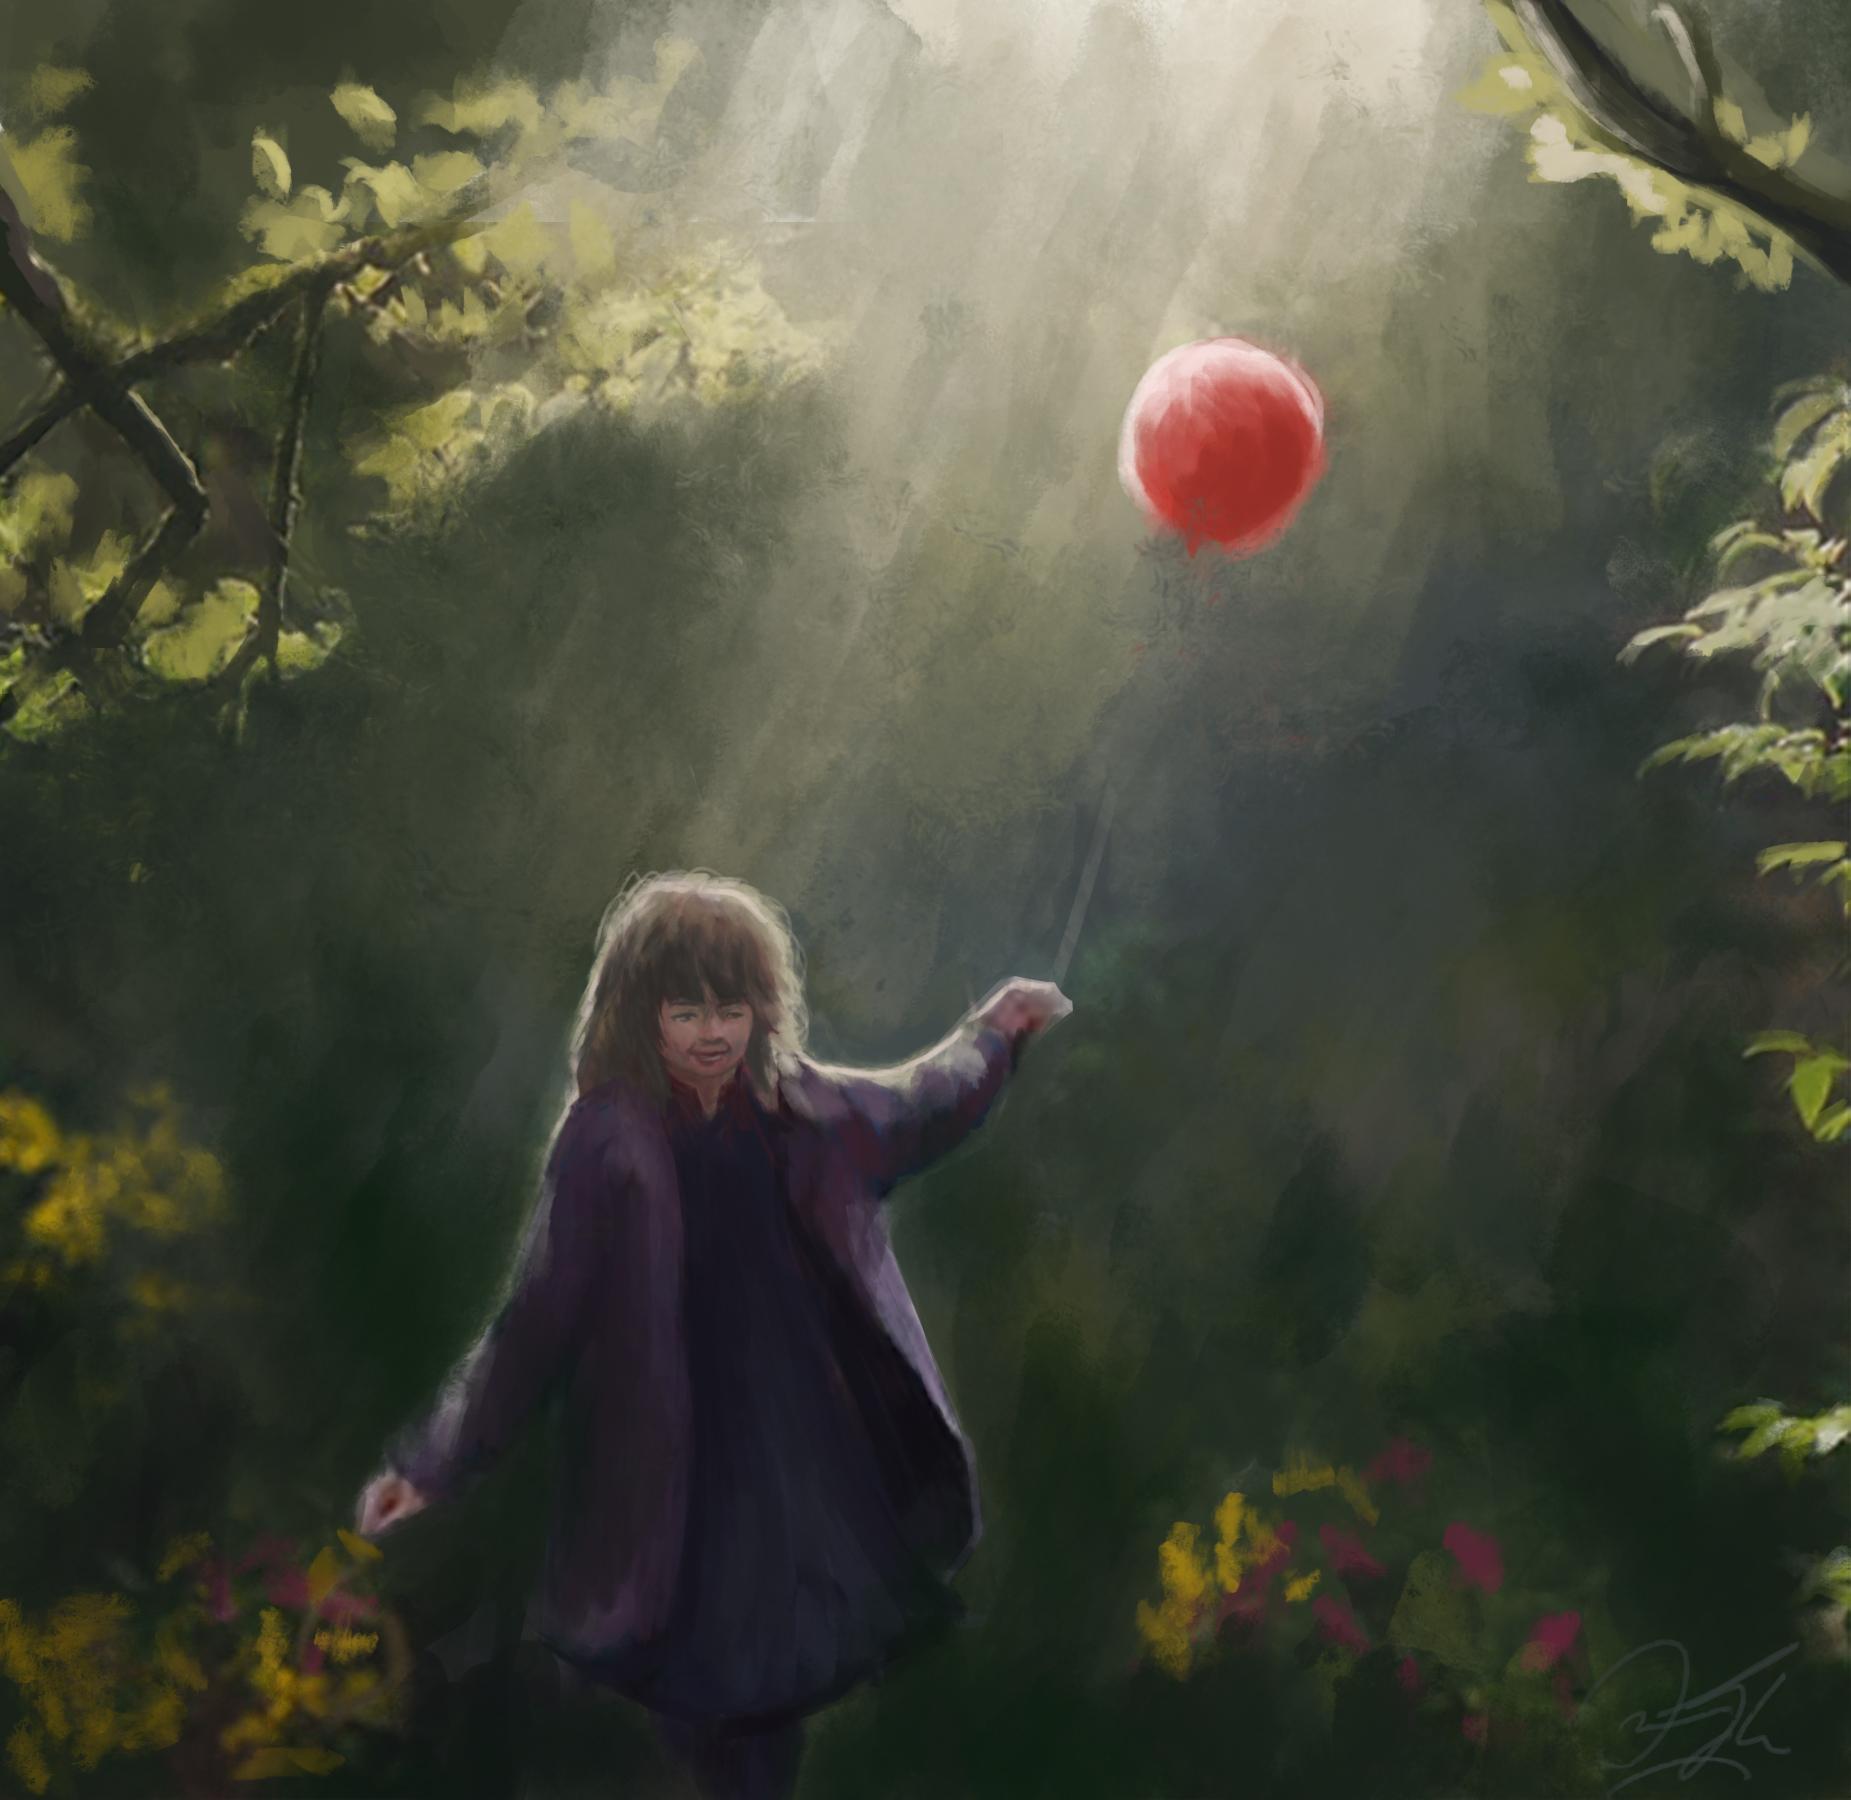 balloongirl winter.jpg